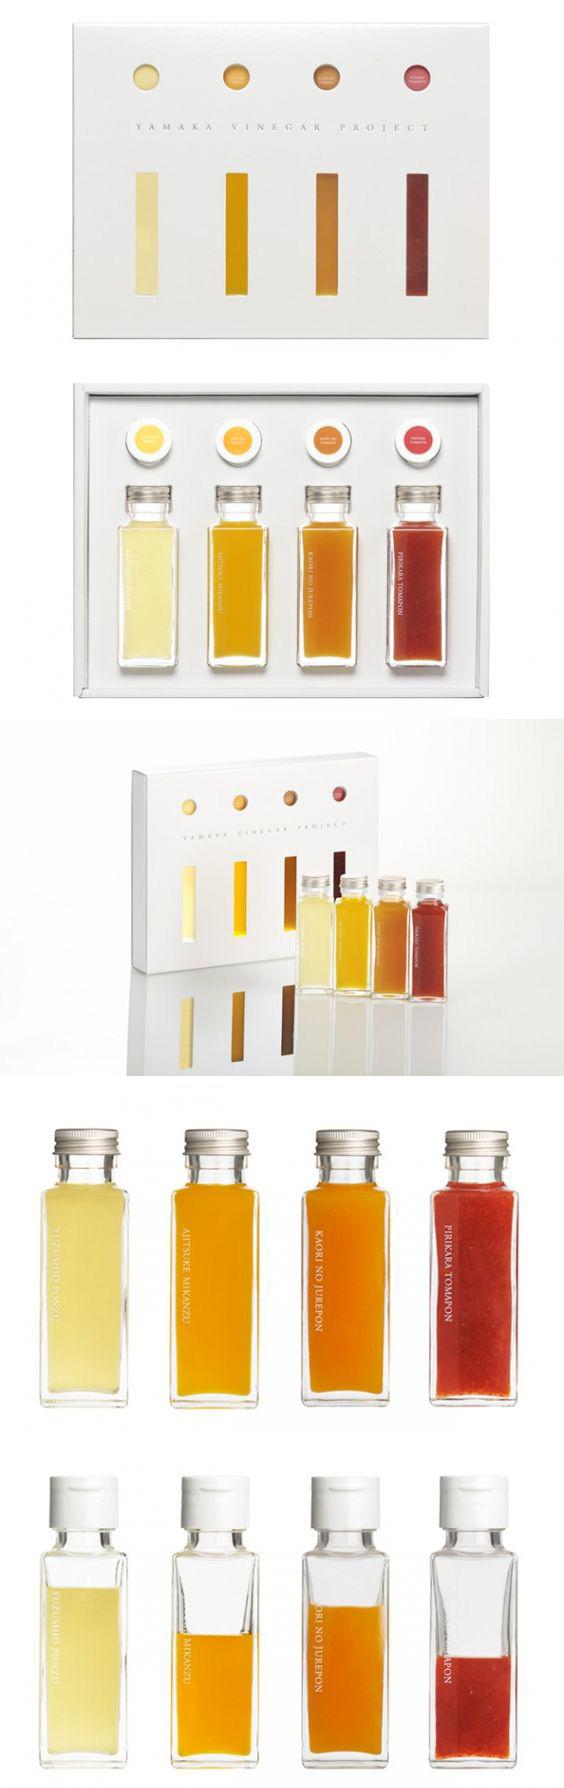 design_packaging05